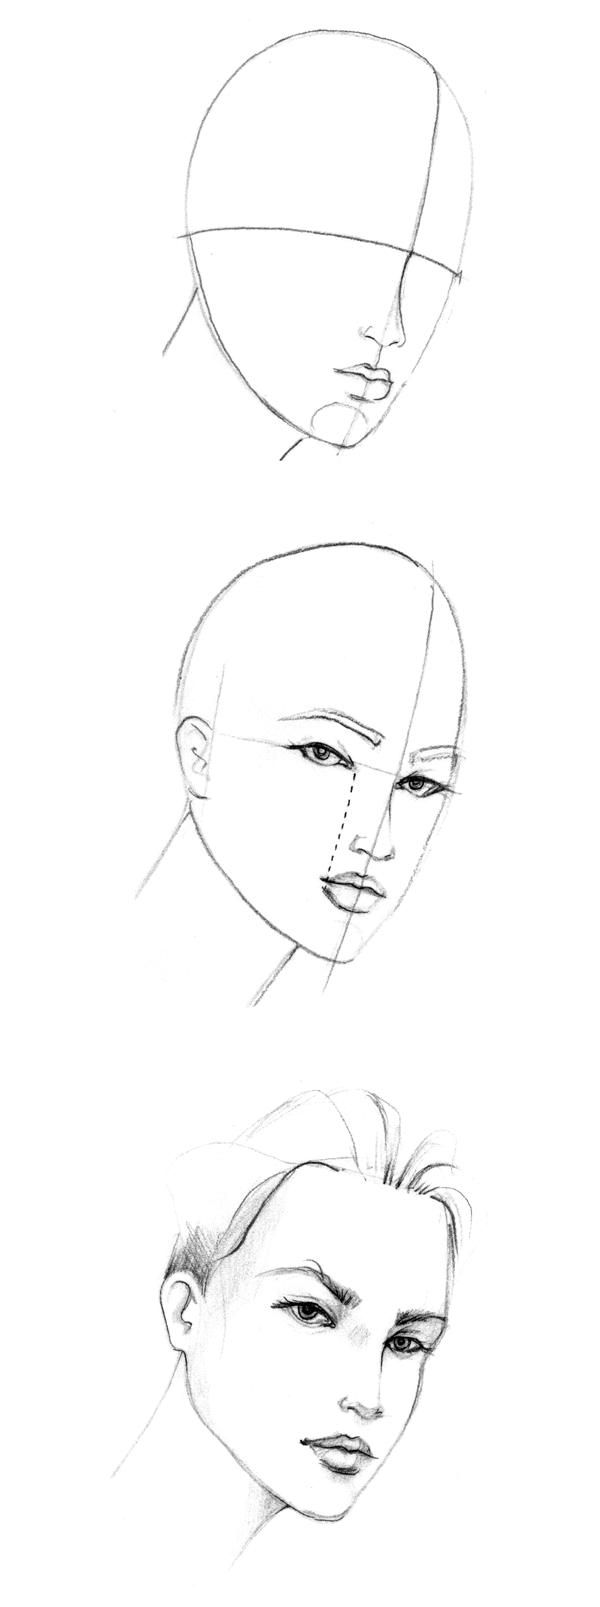 Drawn profile woman's THE 34View_Face2 DRAW SCHOOL QUARTER